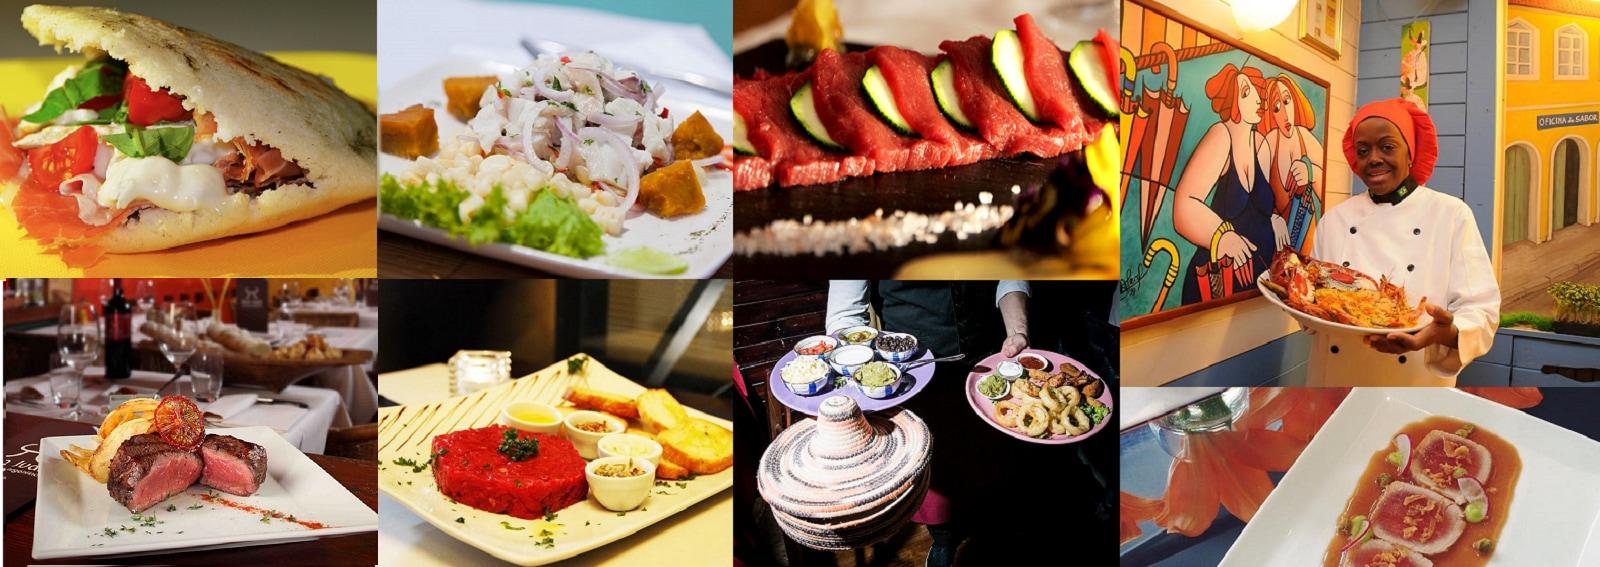 ristoranti sudamericani